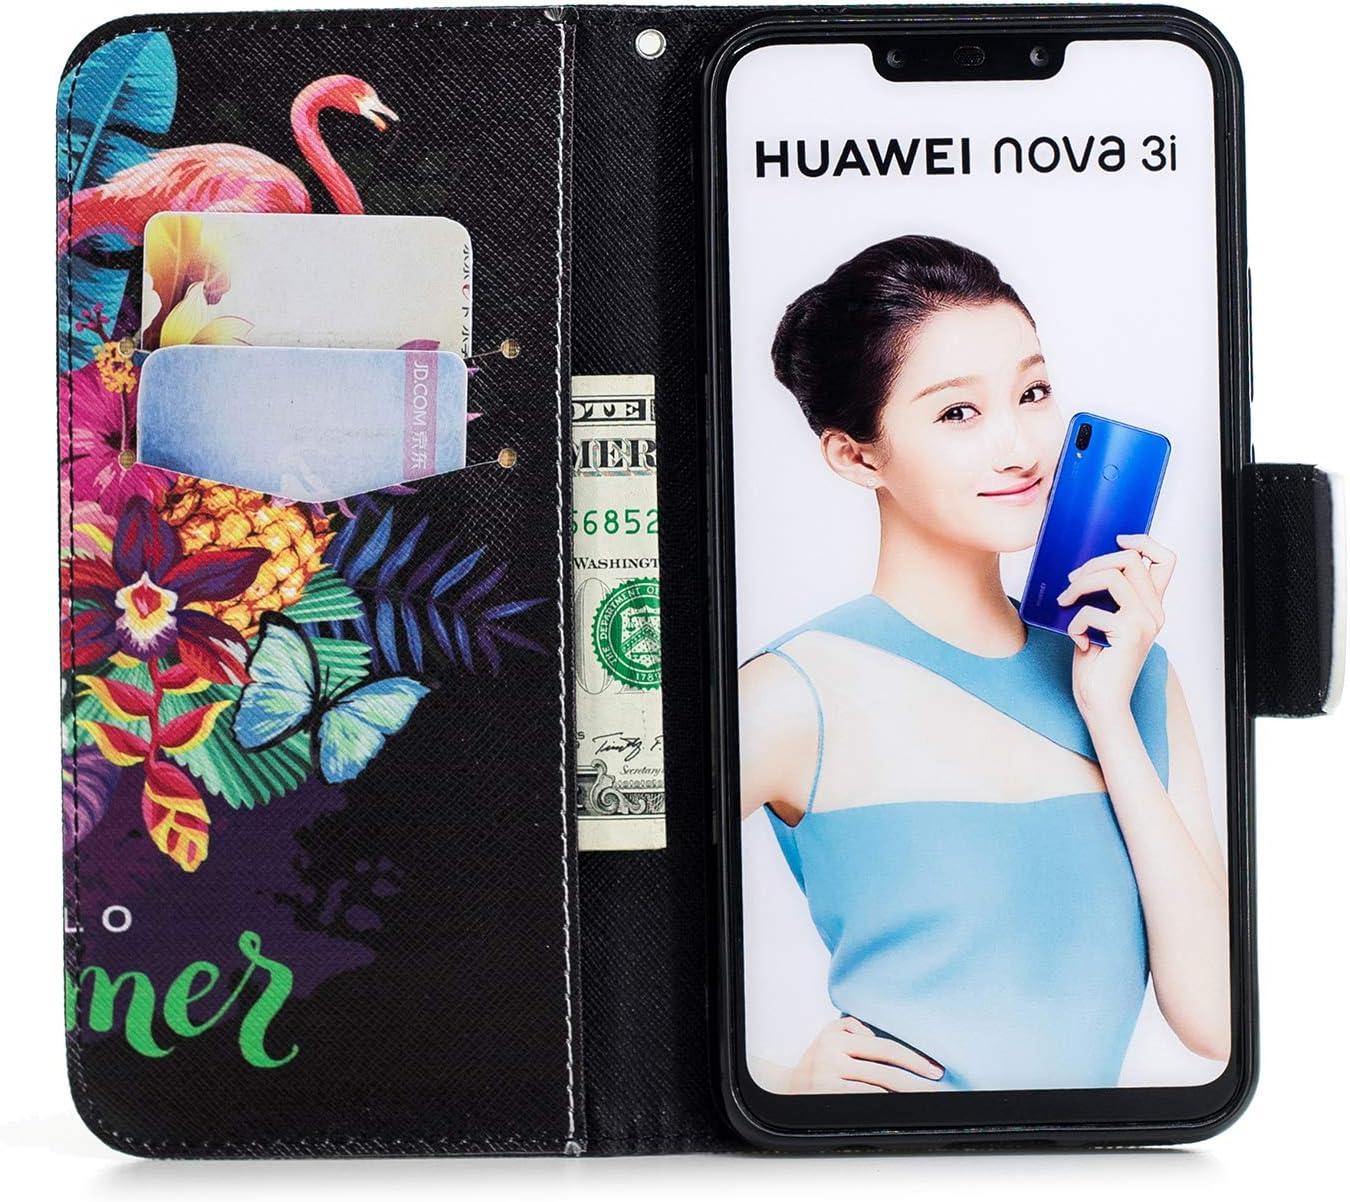 Case Huawei Nova 3i // P Smart+ LOBFE13983#1 Lomogo Leather Wallet Case with Kickstand Card Holder Shockproof Flip Case Cover for Huawei Nova3i//P Smart Plus 2018